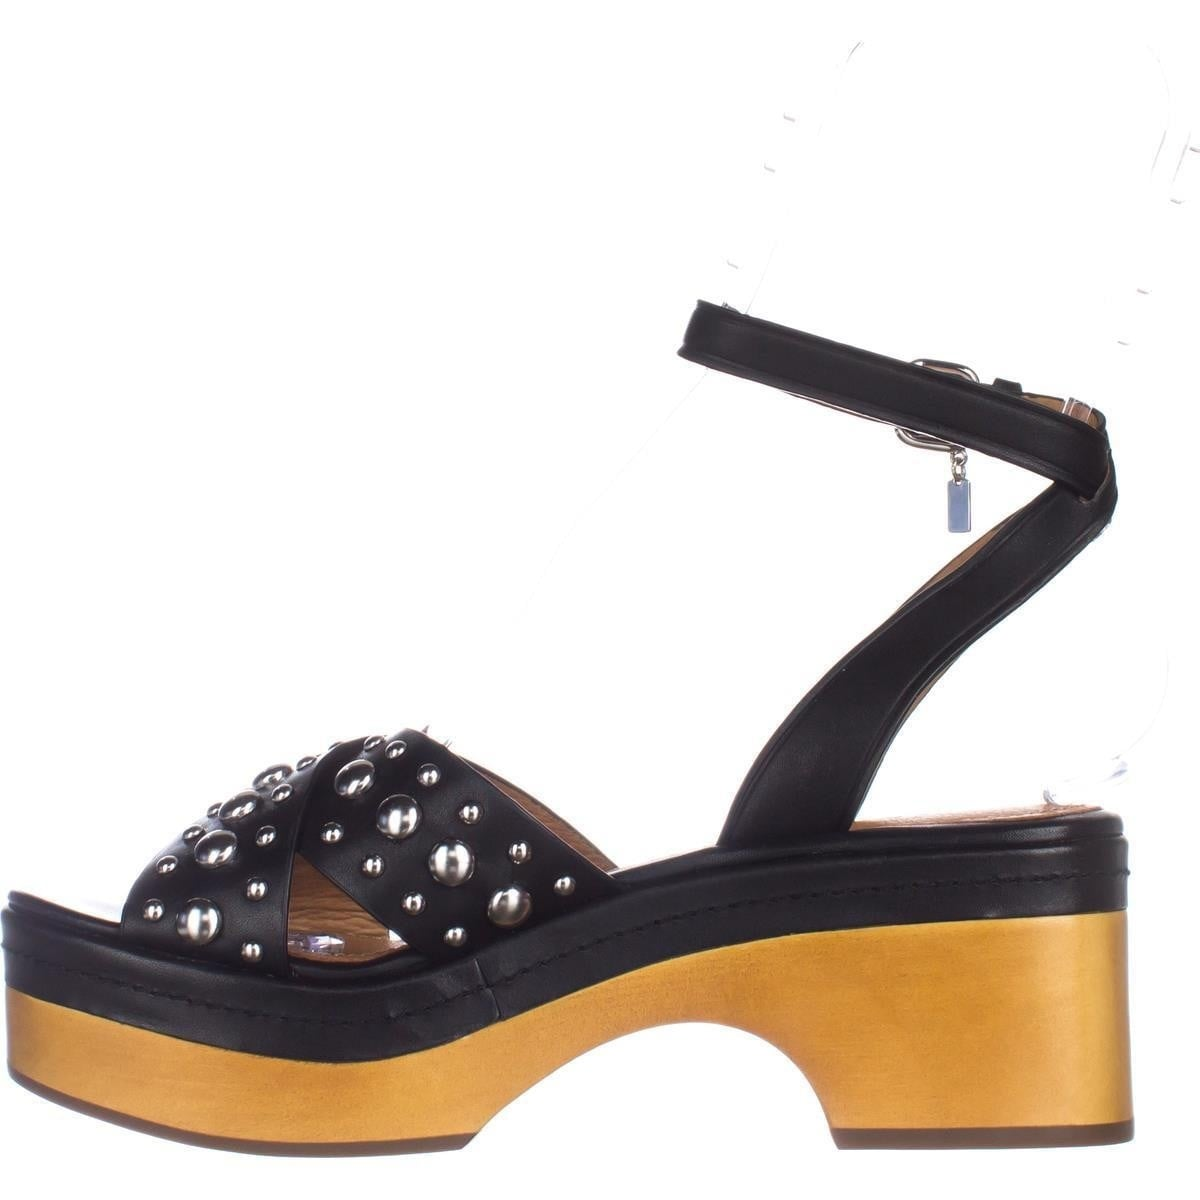 692586d54dc Buy Black Coach Women's Sandals Online at Overstock | Our Best ...